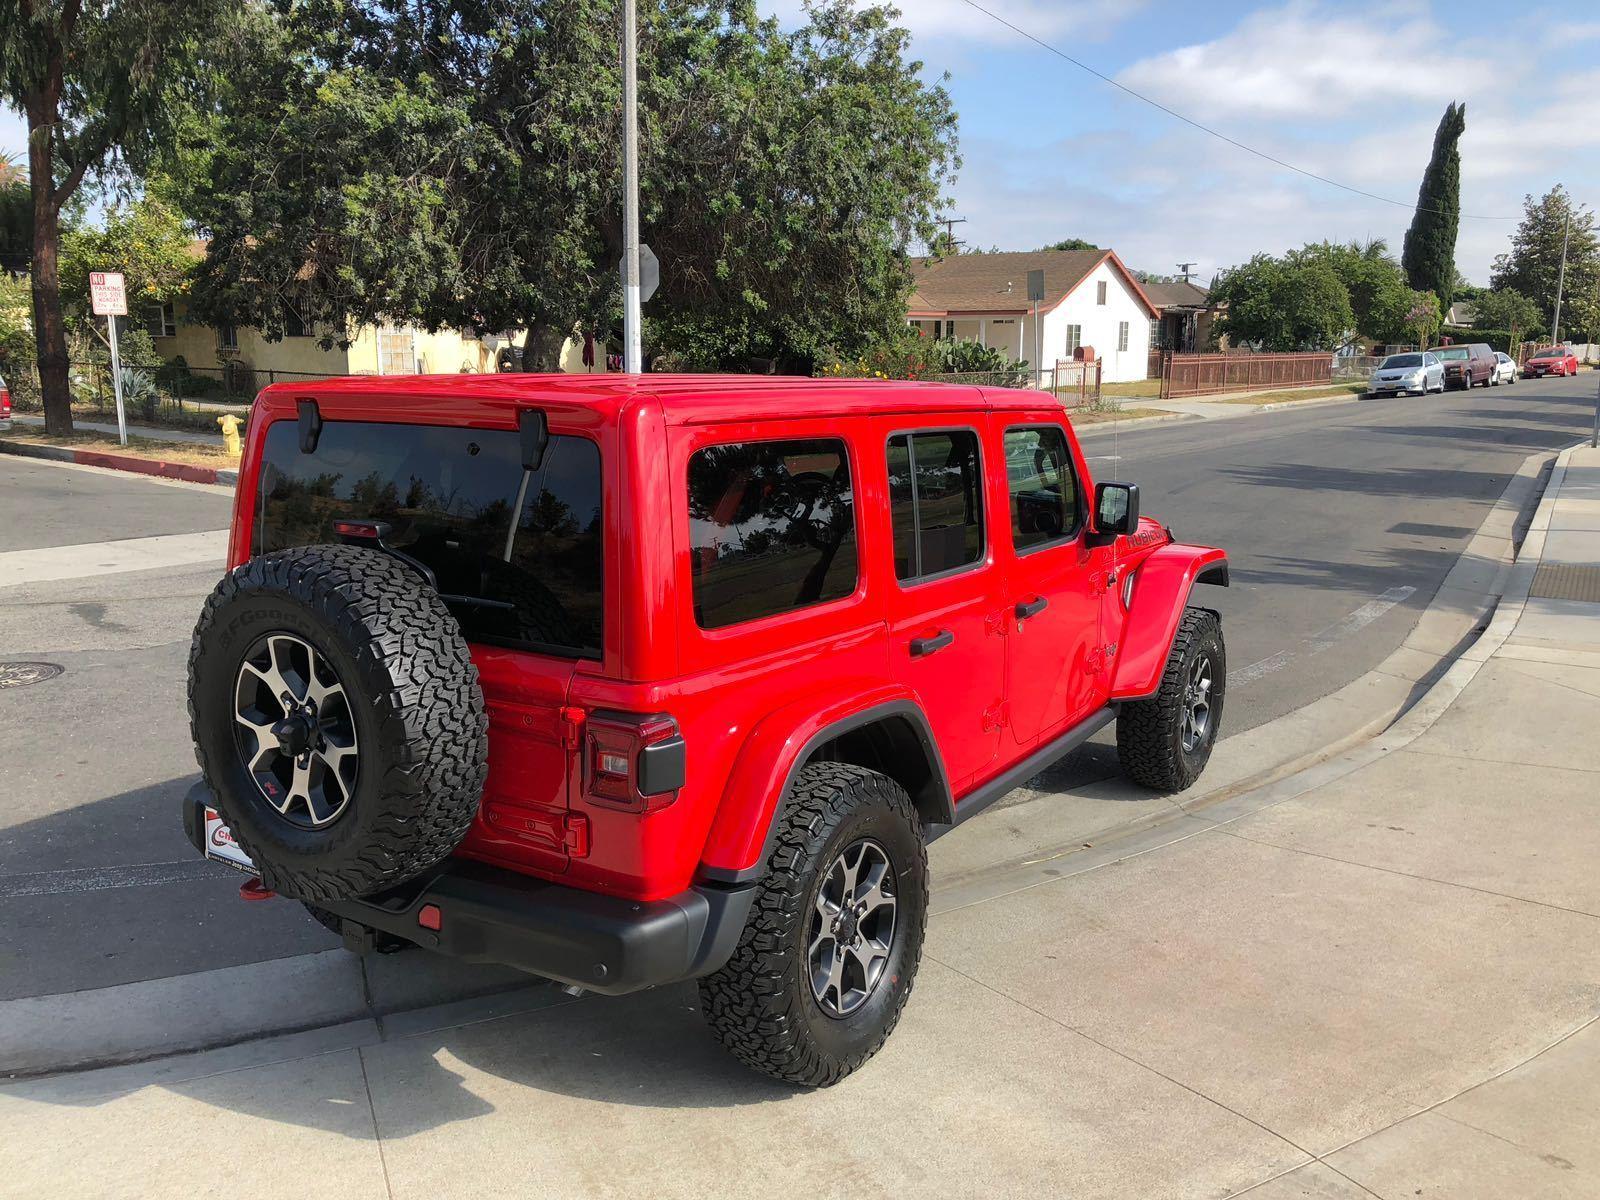 Used 2018 Jeep Wrangler Rubicon 2018 Jeep Wrangler Unlimited Jl Rubicon 4 4 2018 Mycarboard Com